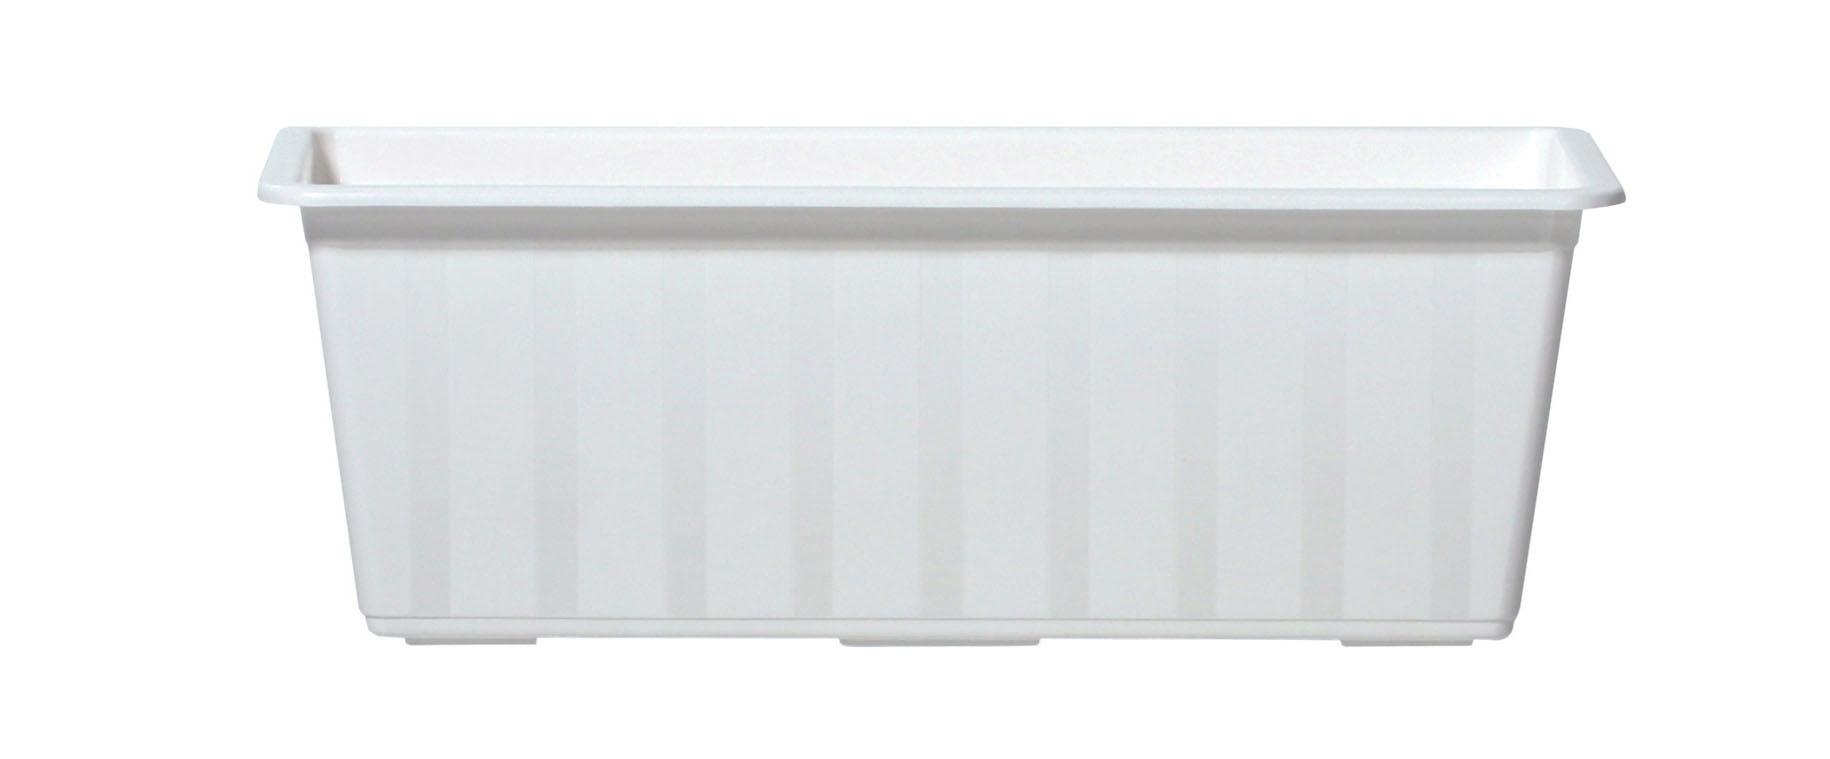 PROSPERPLAST Truhlík AGRO bílý 50cm